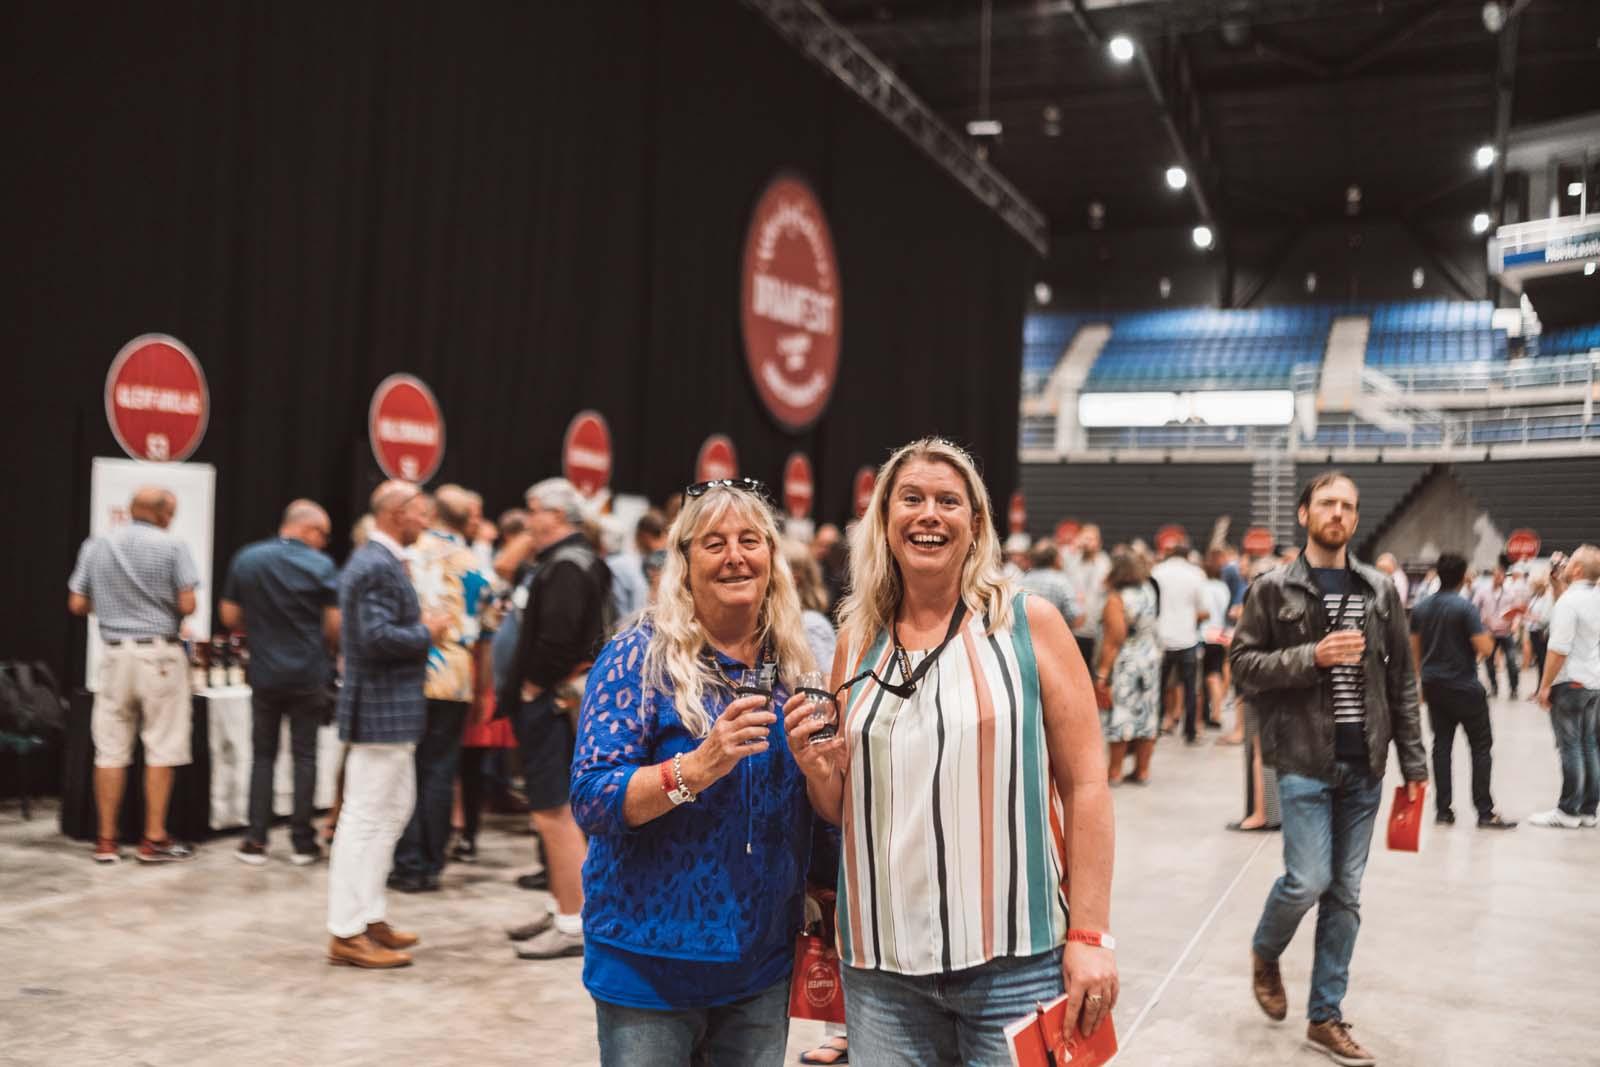 Dramfest 2018 for Whisky Galore-317.jpg